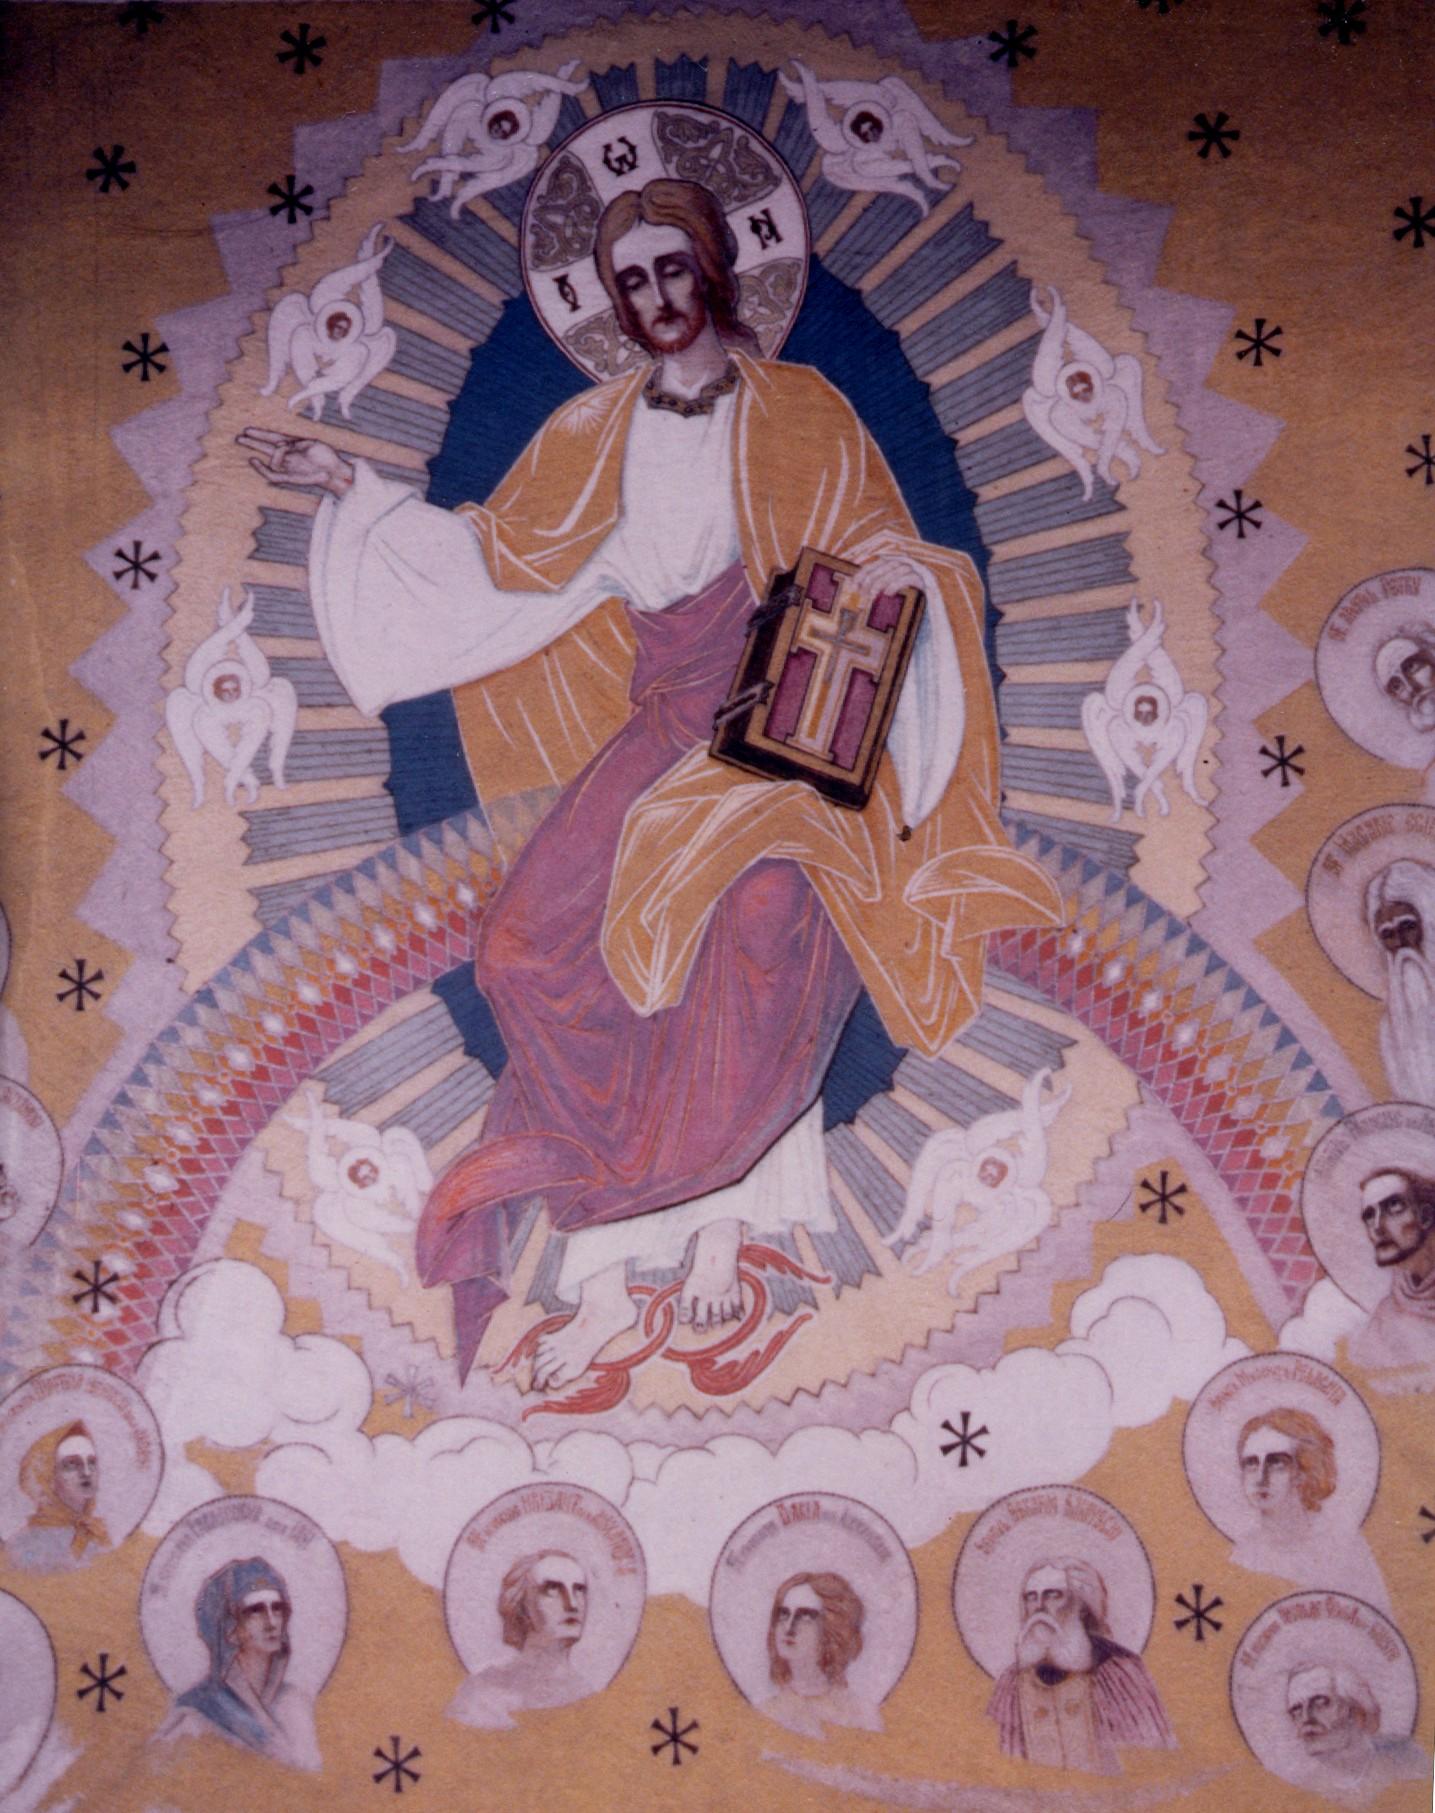 Parintele Arsenie Boca - pictorul de la Biserica Draganescu